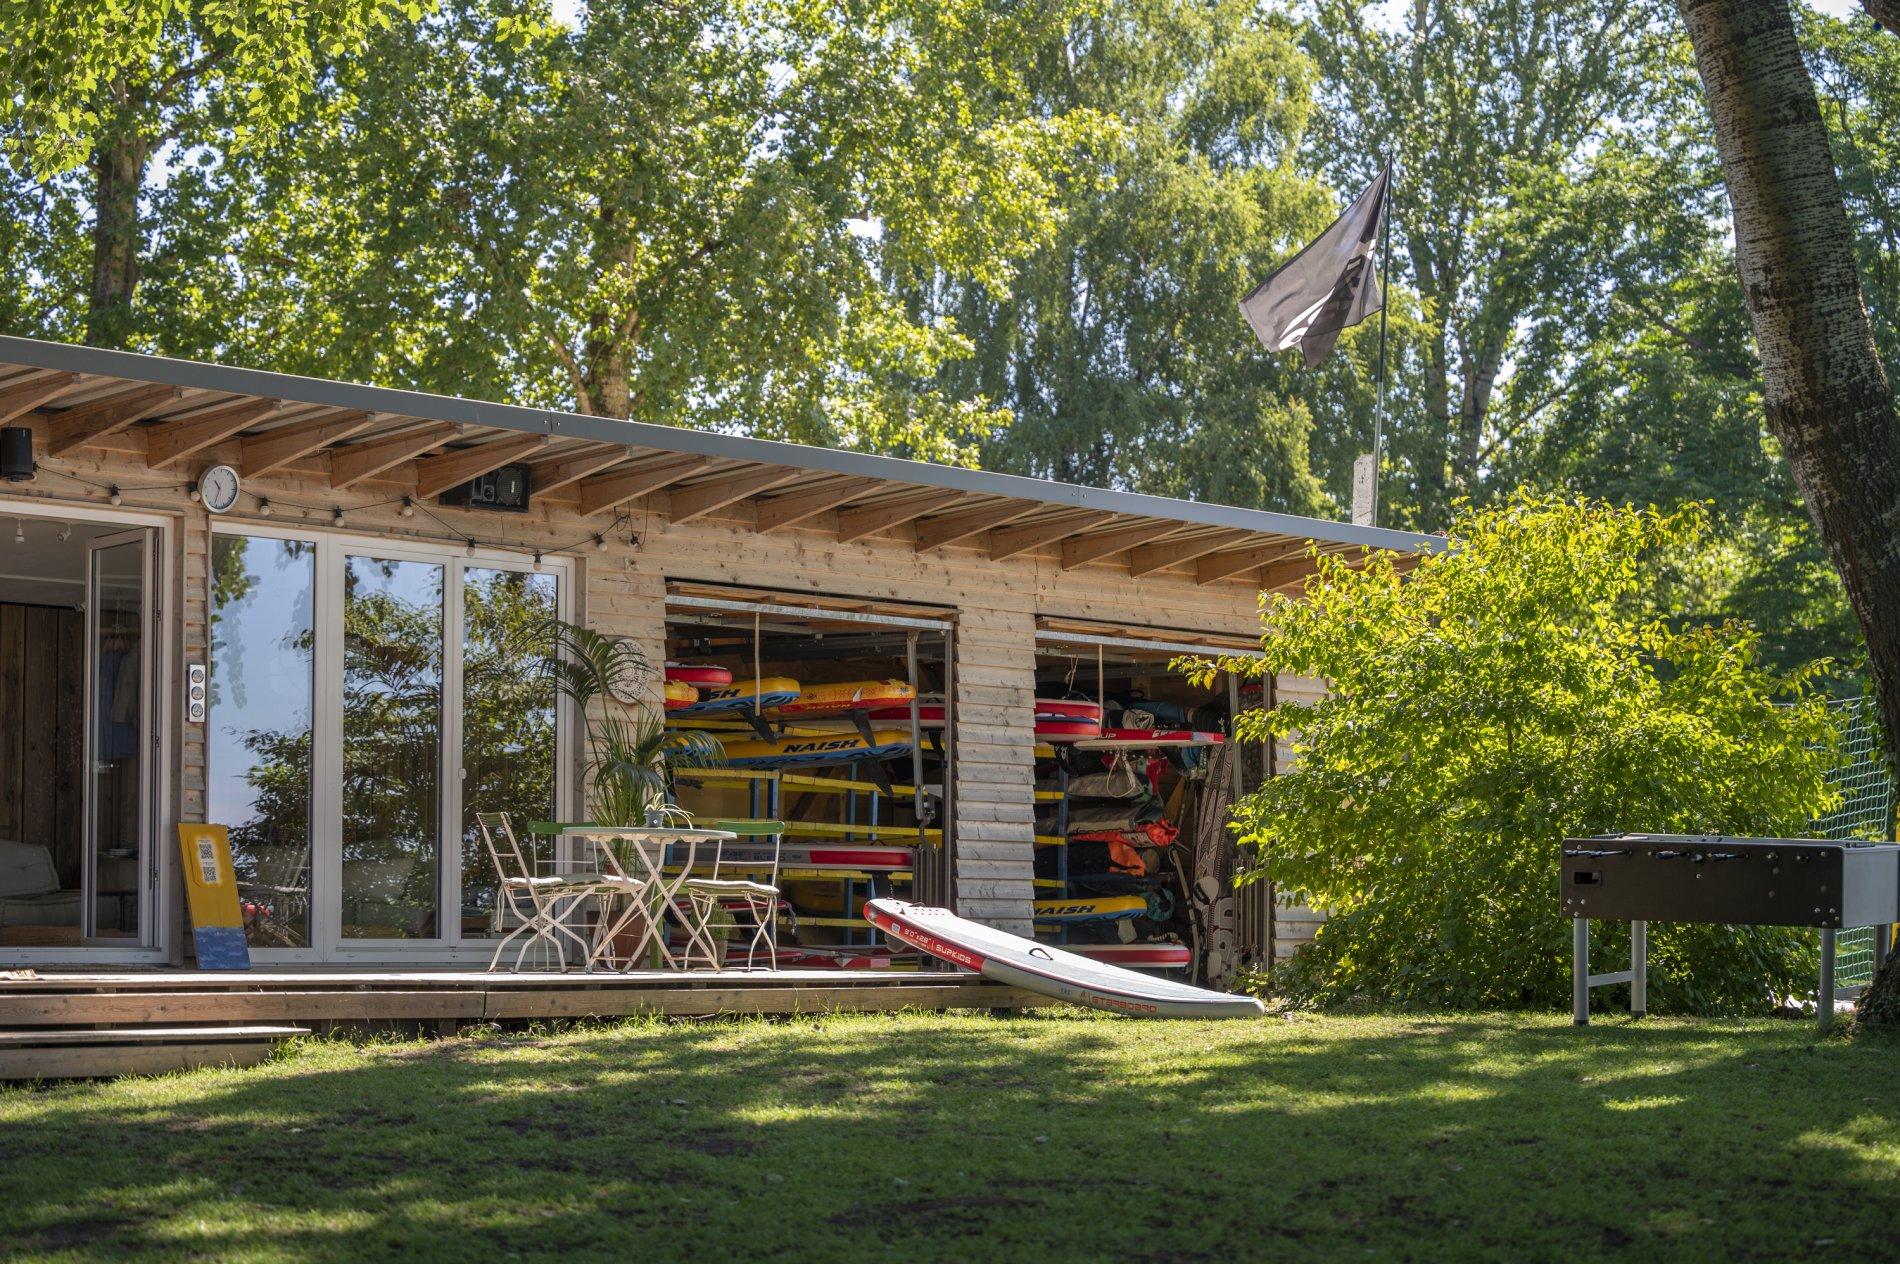 Surfschule Bodensee